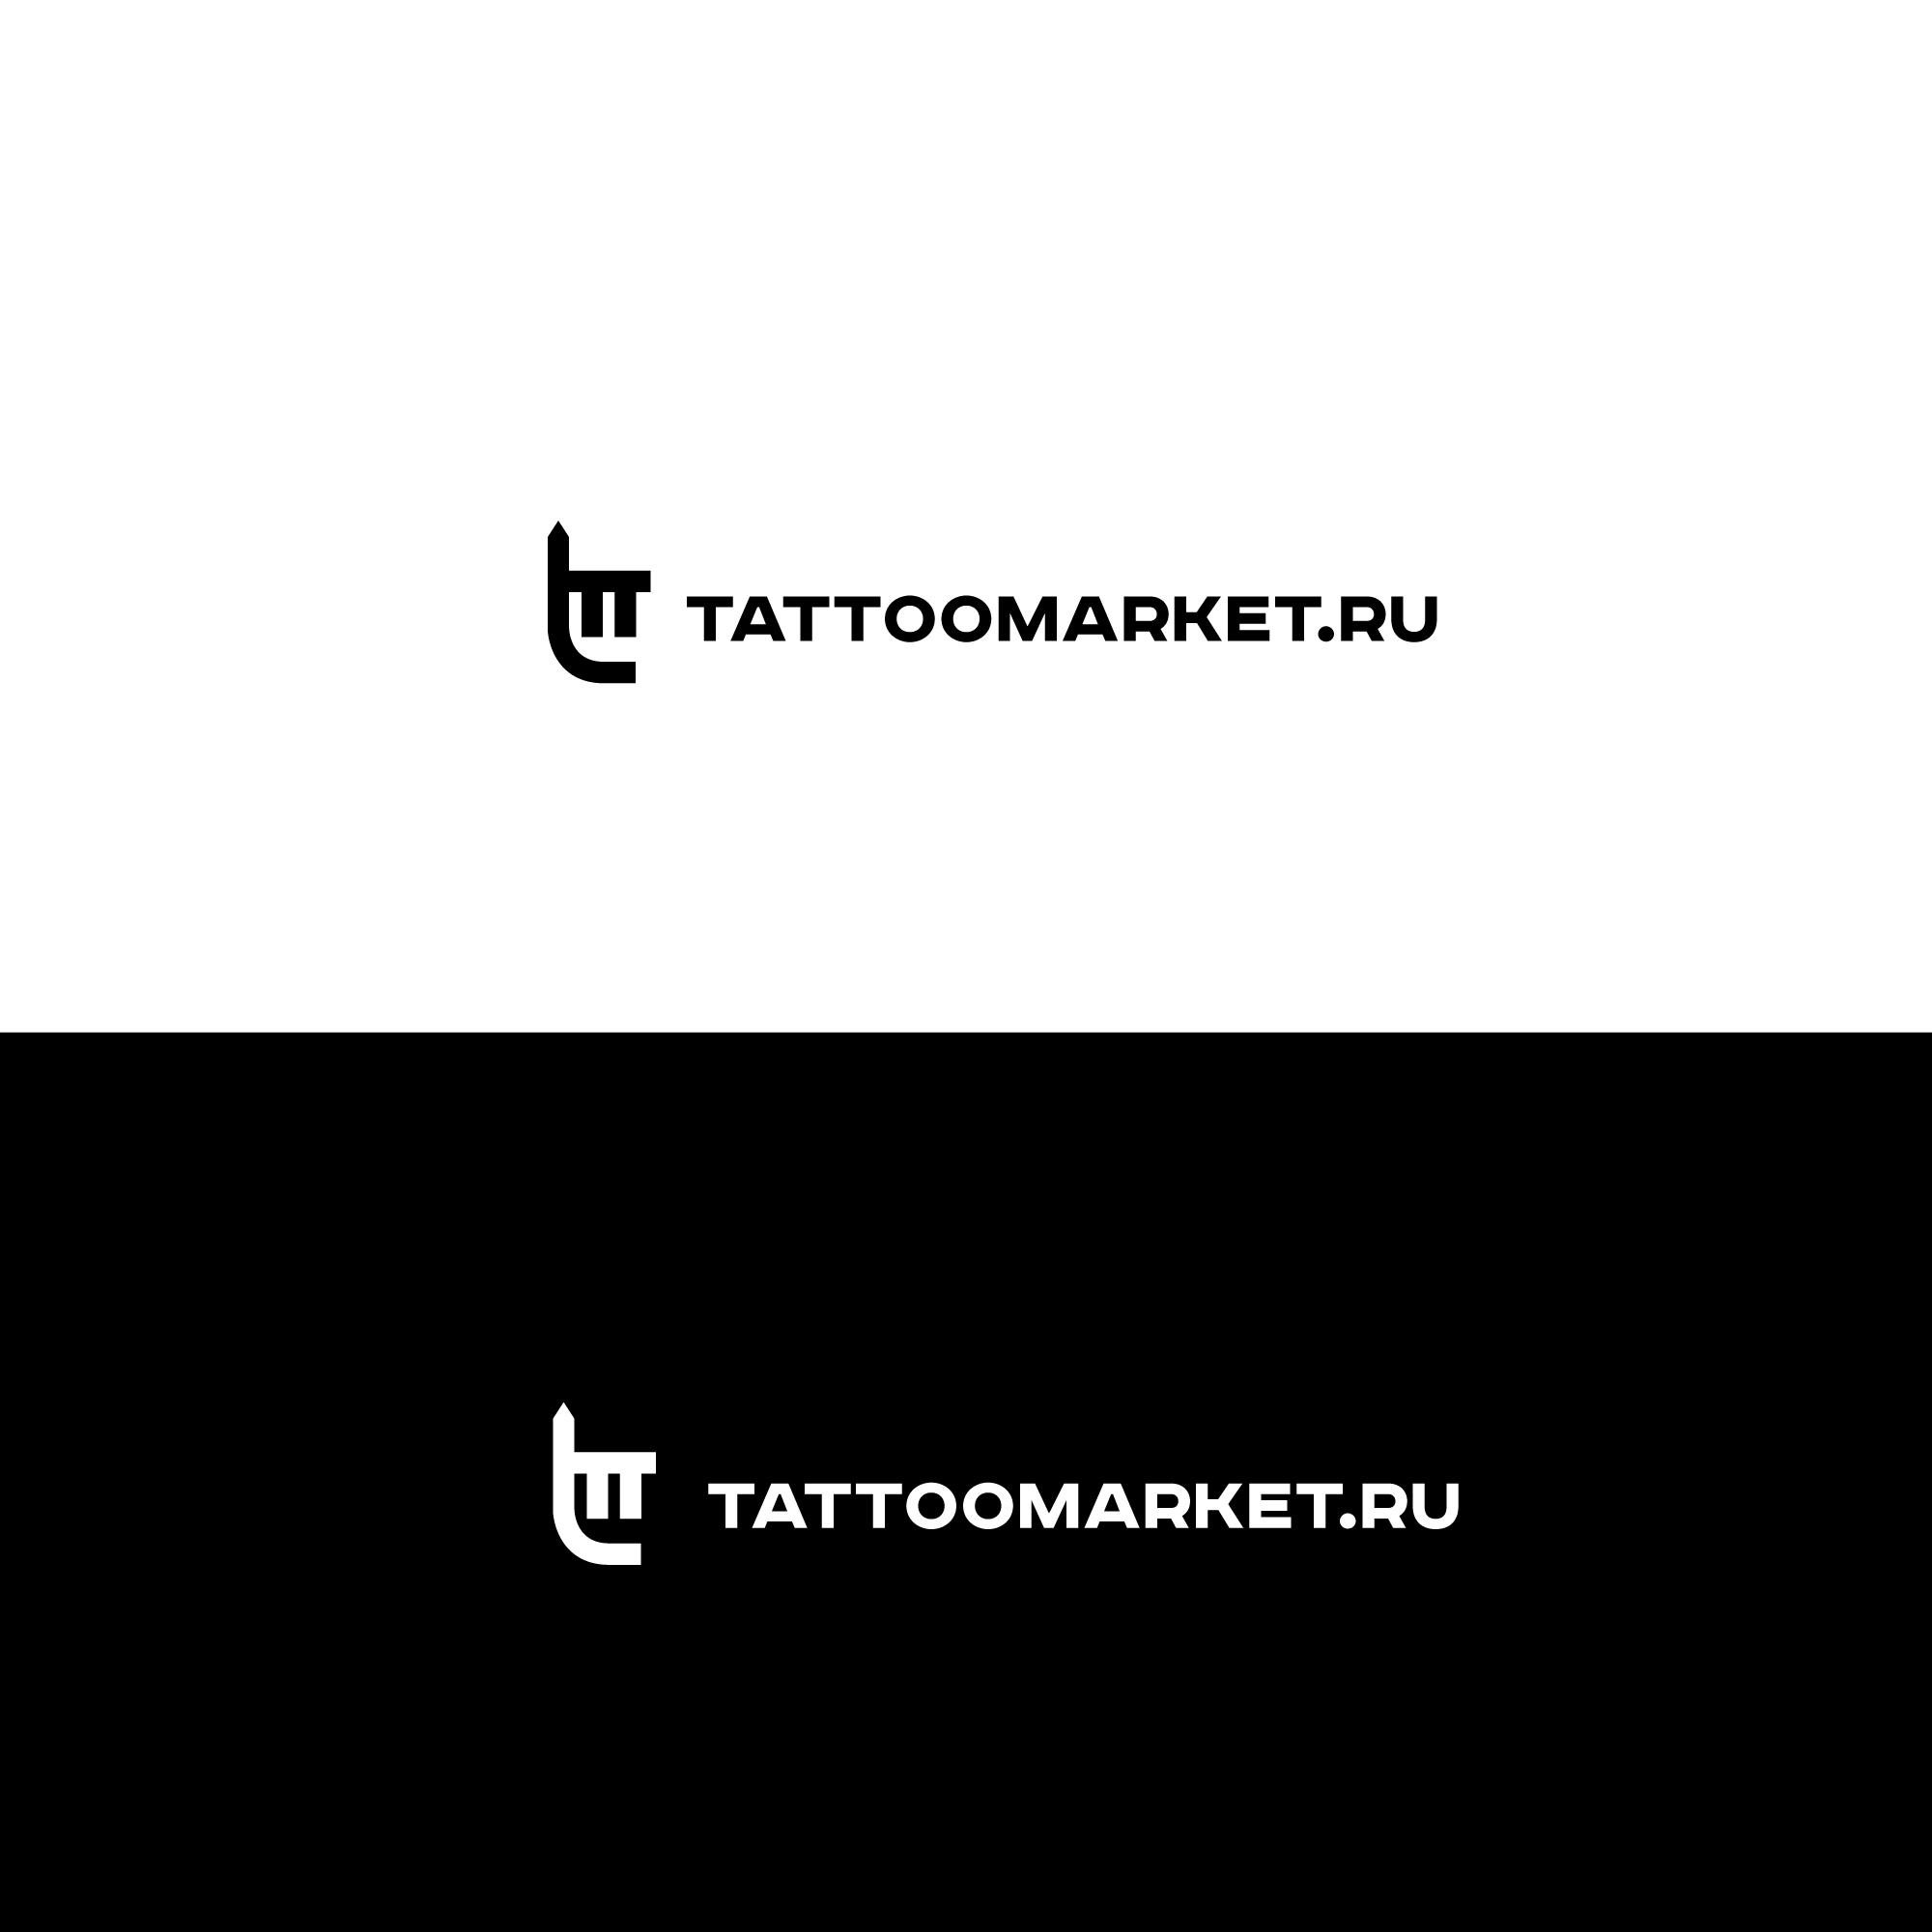 Редизайн логотипа магазина тату оборудования TattooMarket.ru фото f_2595c401eb9685d2.jpg